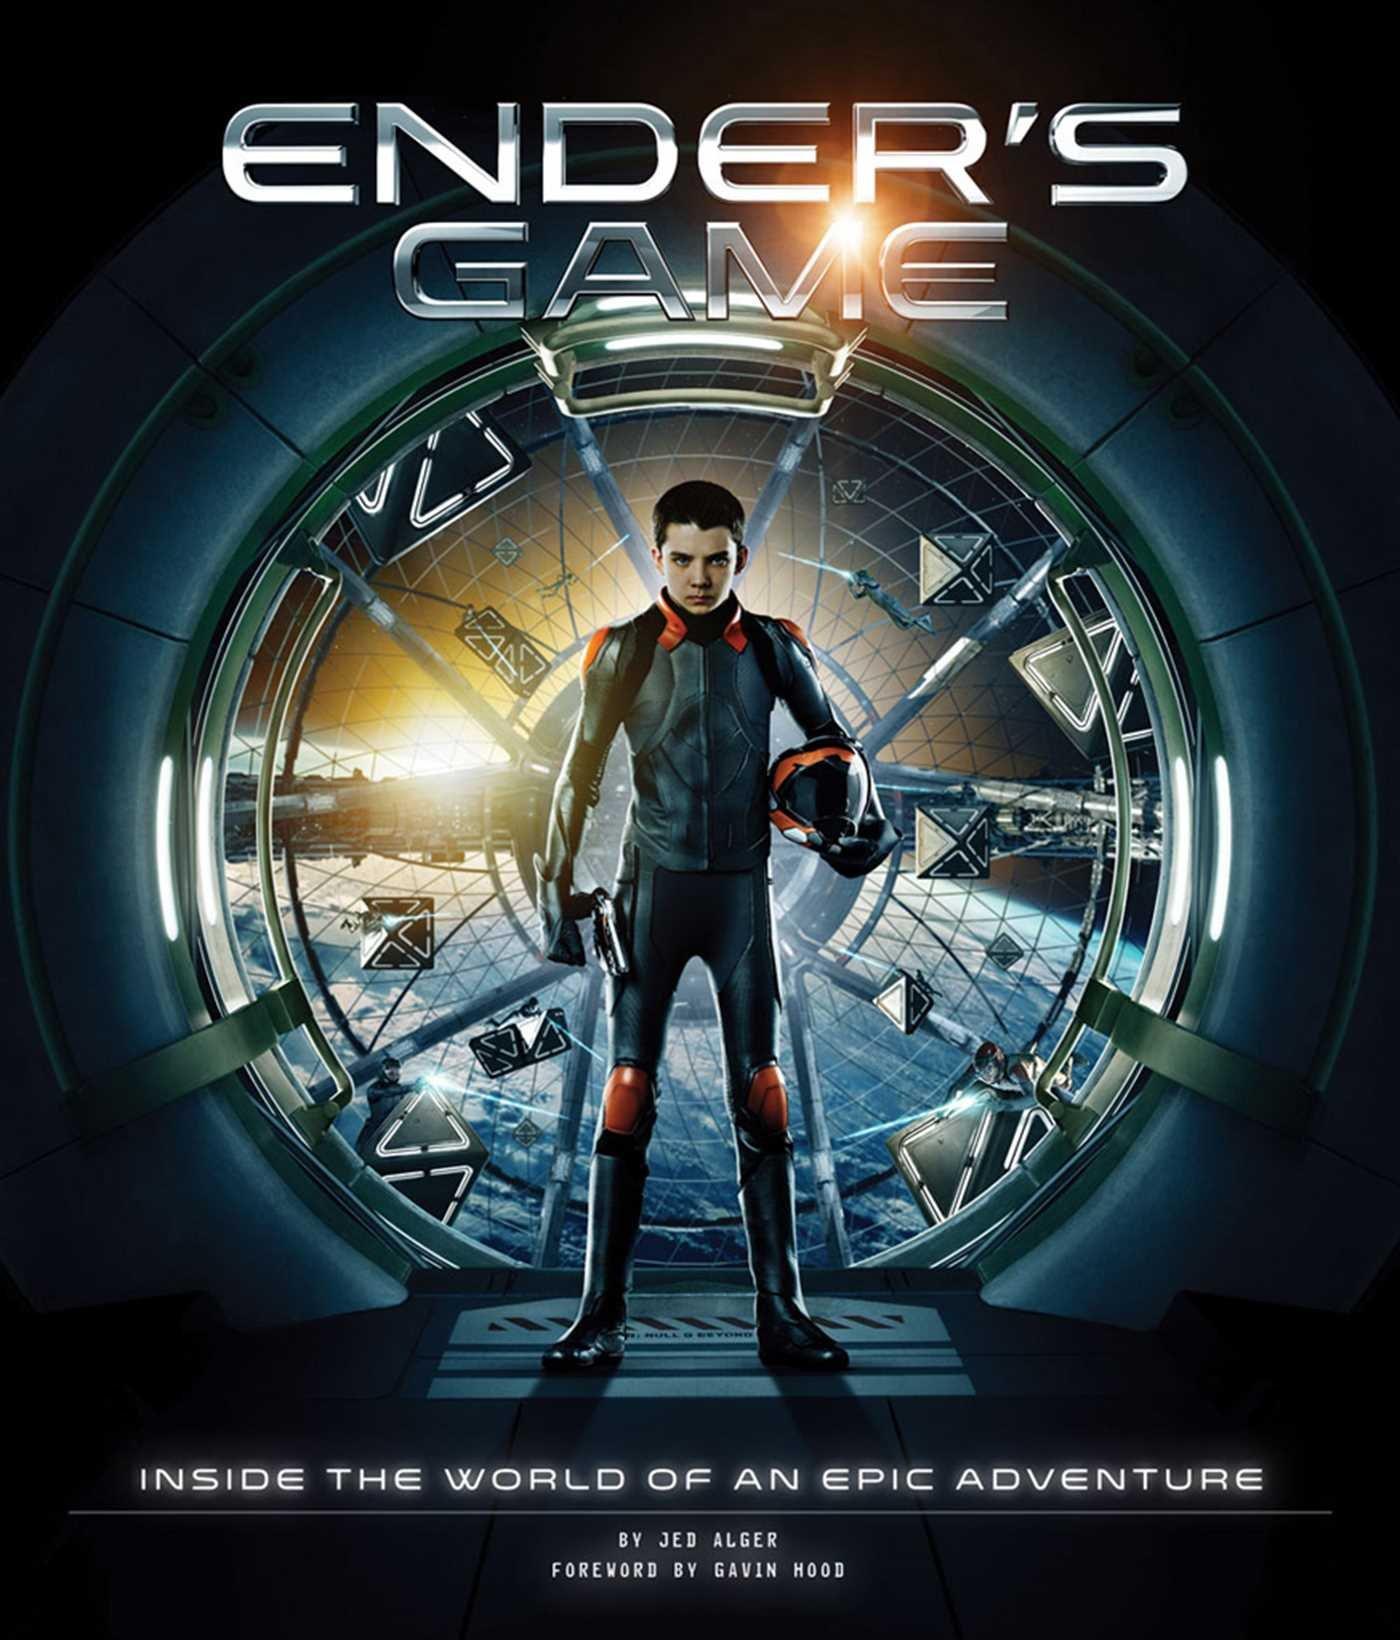 Ender's Game: Inside the World of an Epic Adventure: Alger, Jed, Hood,  Gavin: 9781608872770: Amazon.com: Books